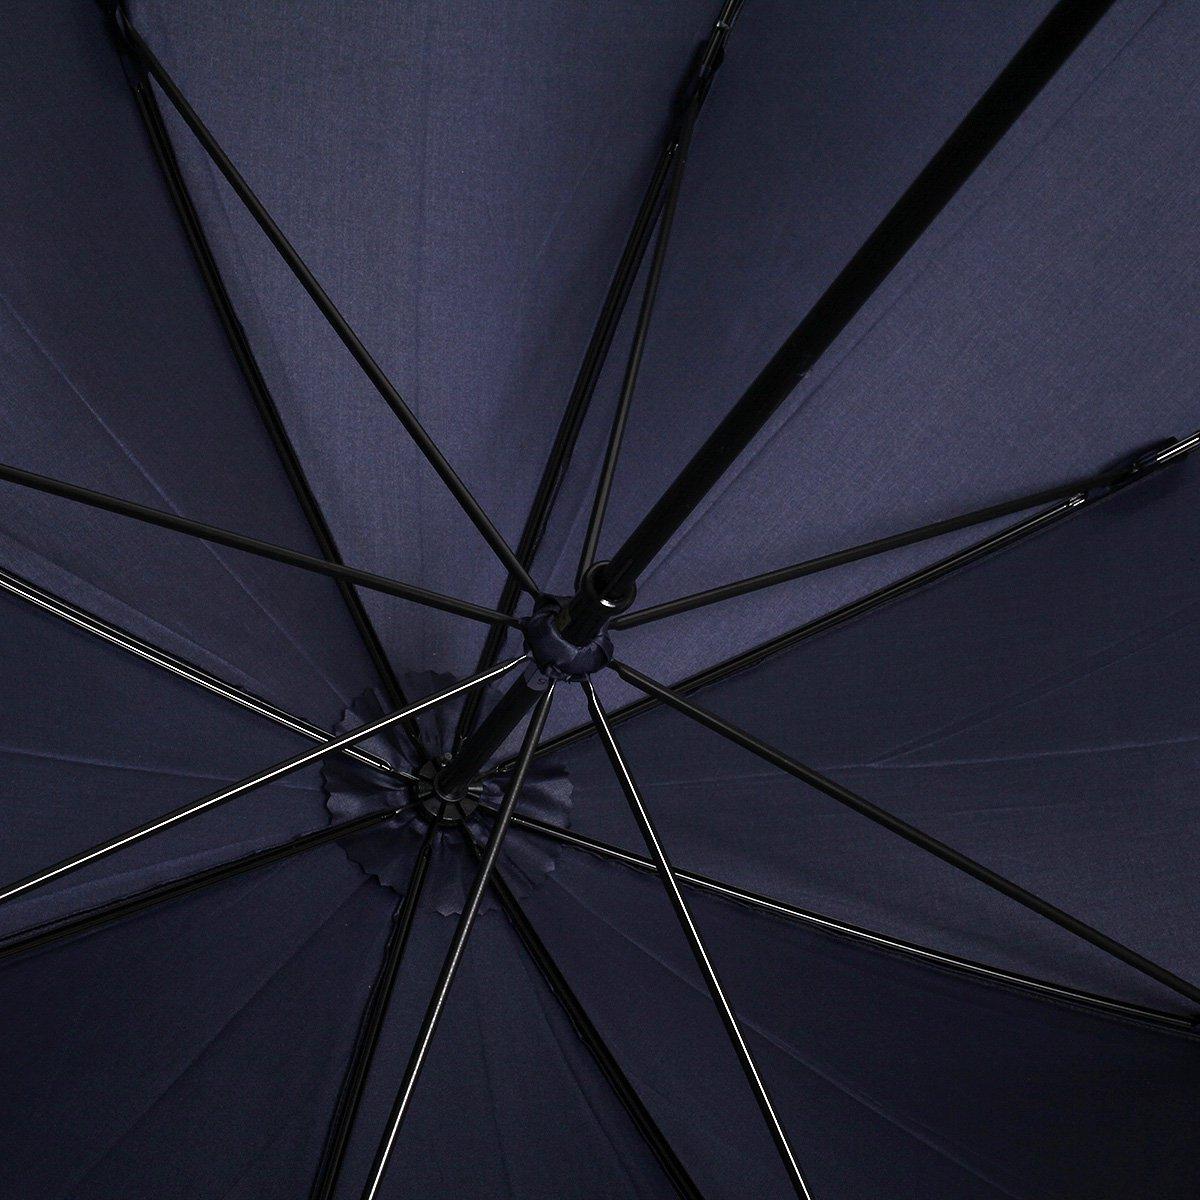 【10%OFF】【公式限定】富士絹 細巻き 長傘(アイアンウッド) 詳細画像11